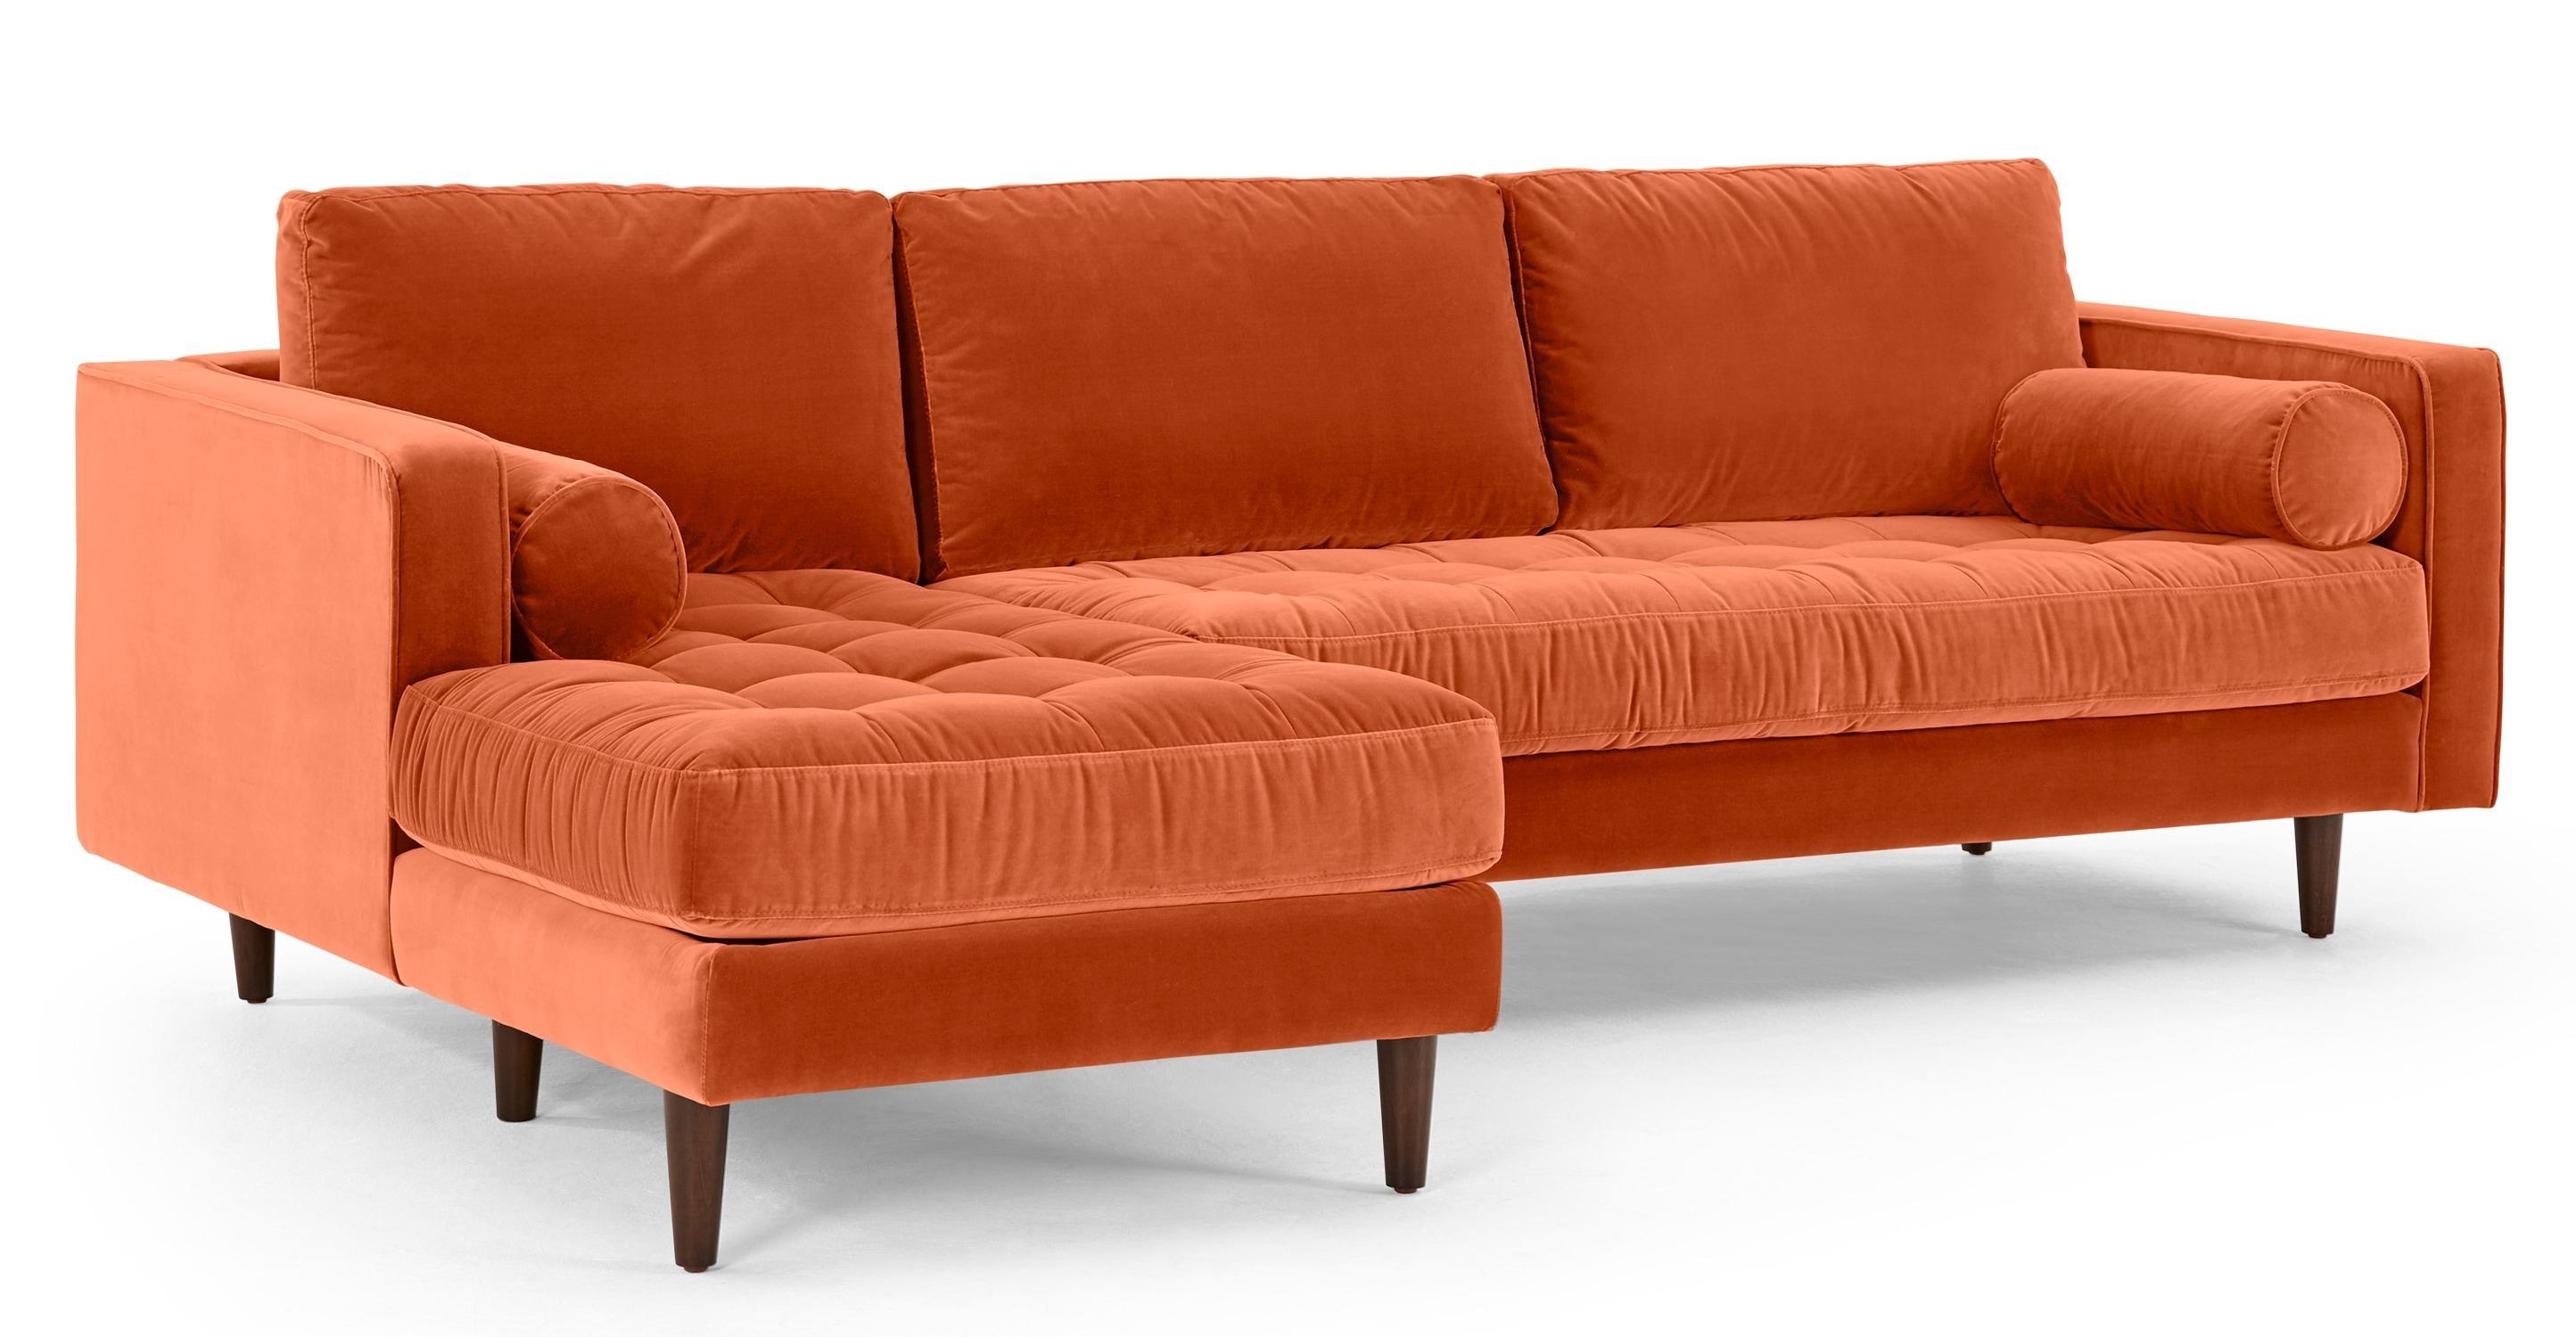 Scott 4 Seater Left Hand Facing Chaise End Sofa, Burnt Orange Throughout Burnt Orange Sofas (View 9 of 20)